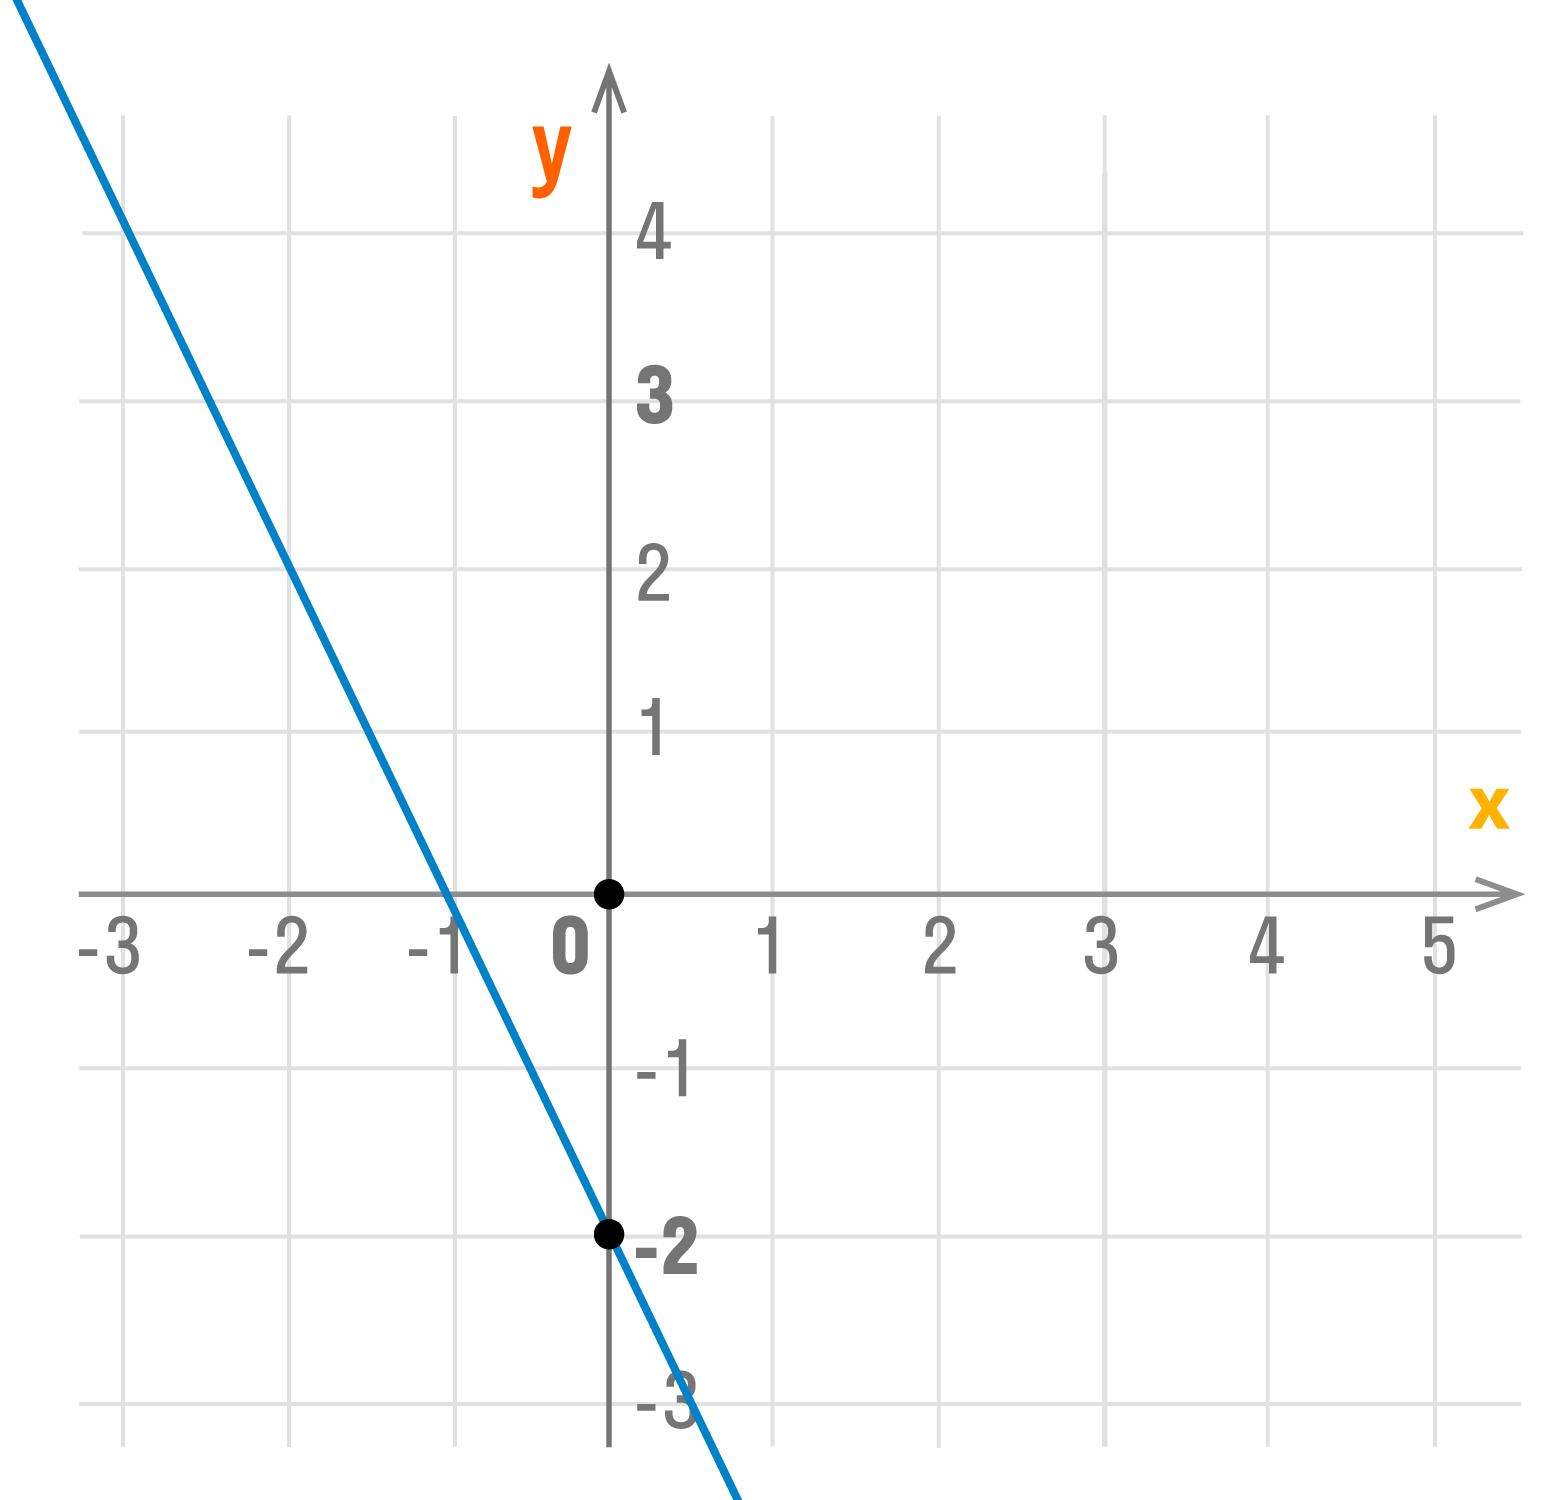 график функции y = kx + b при k < 0 и b < 0